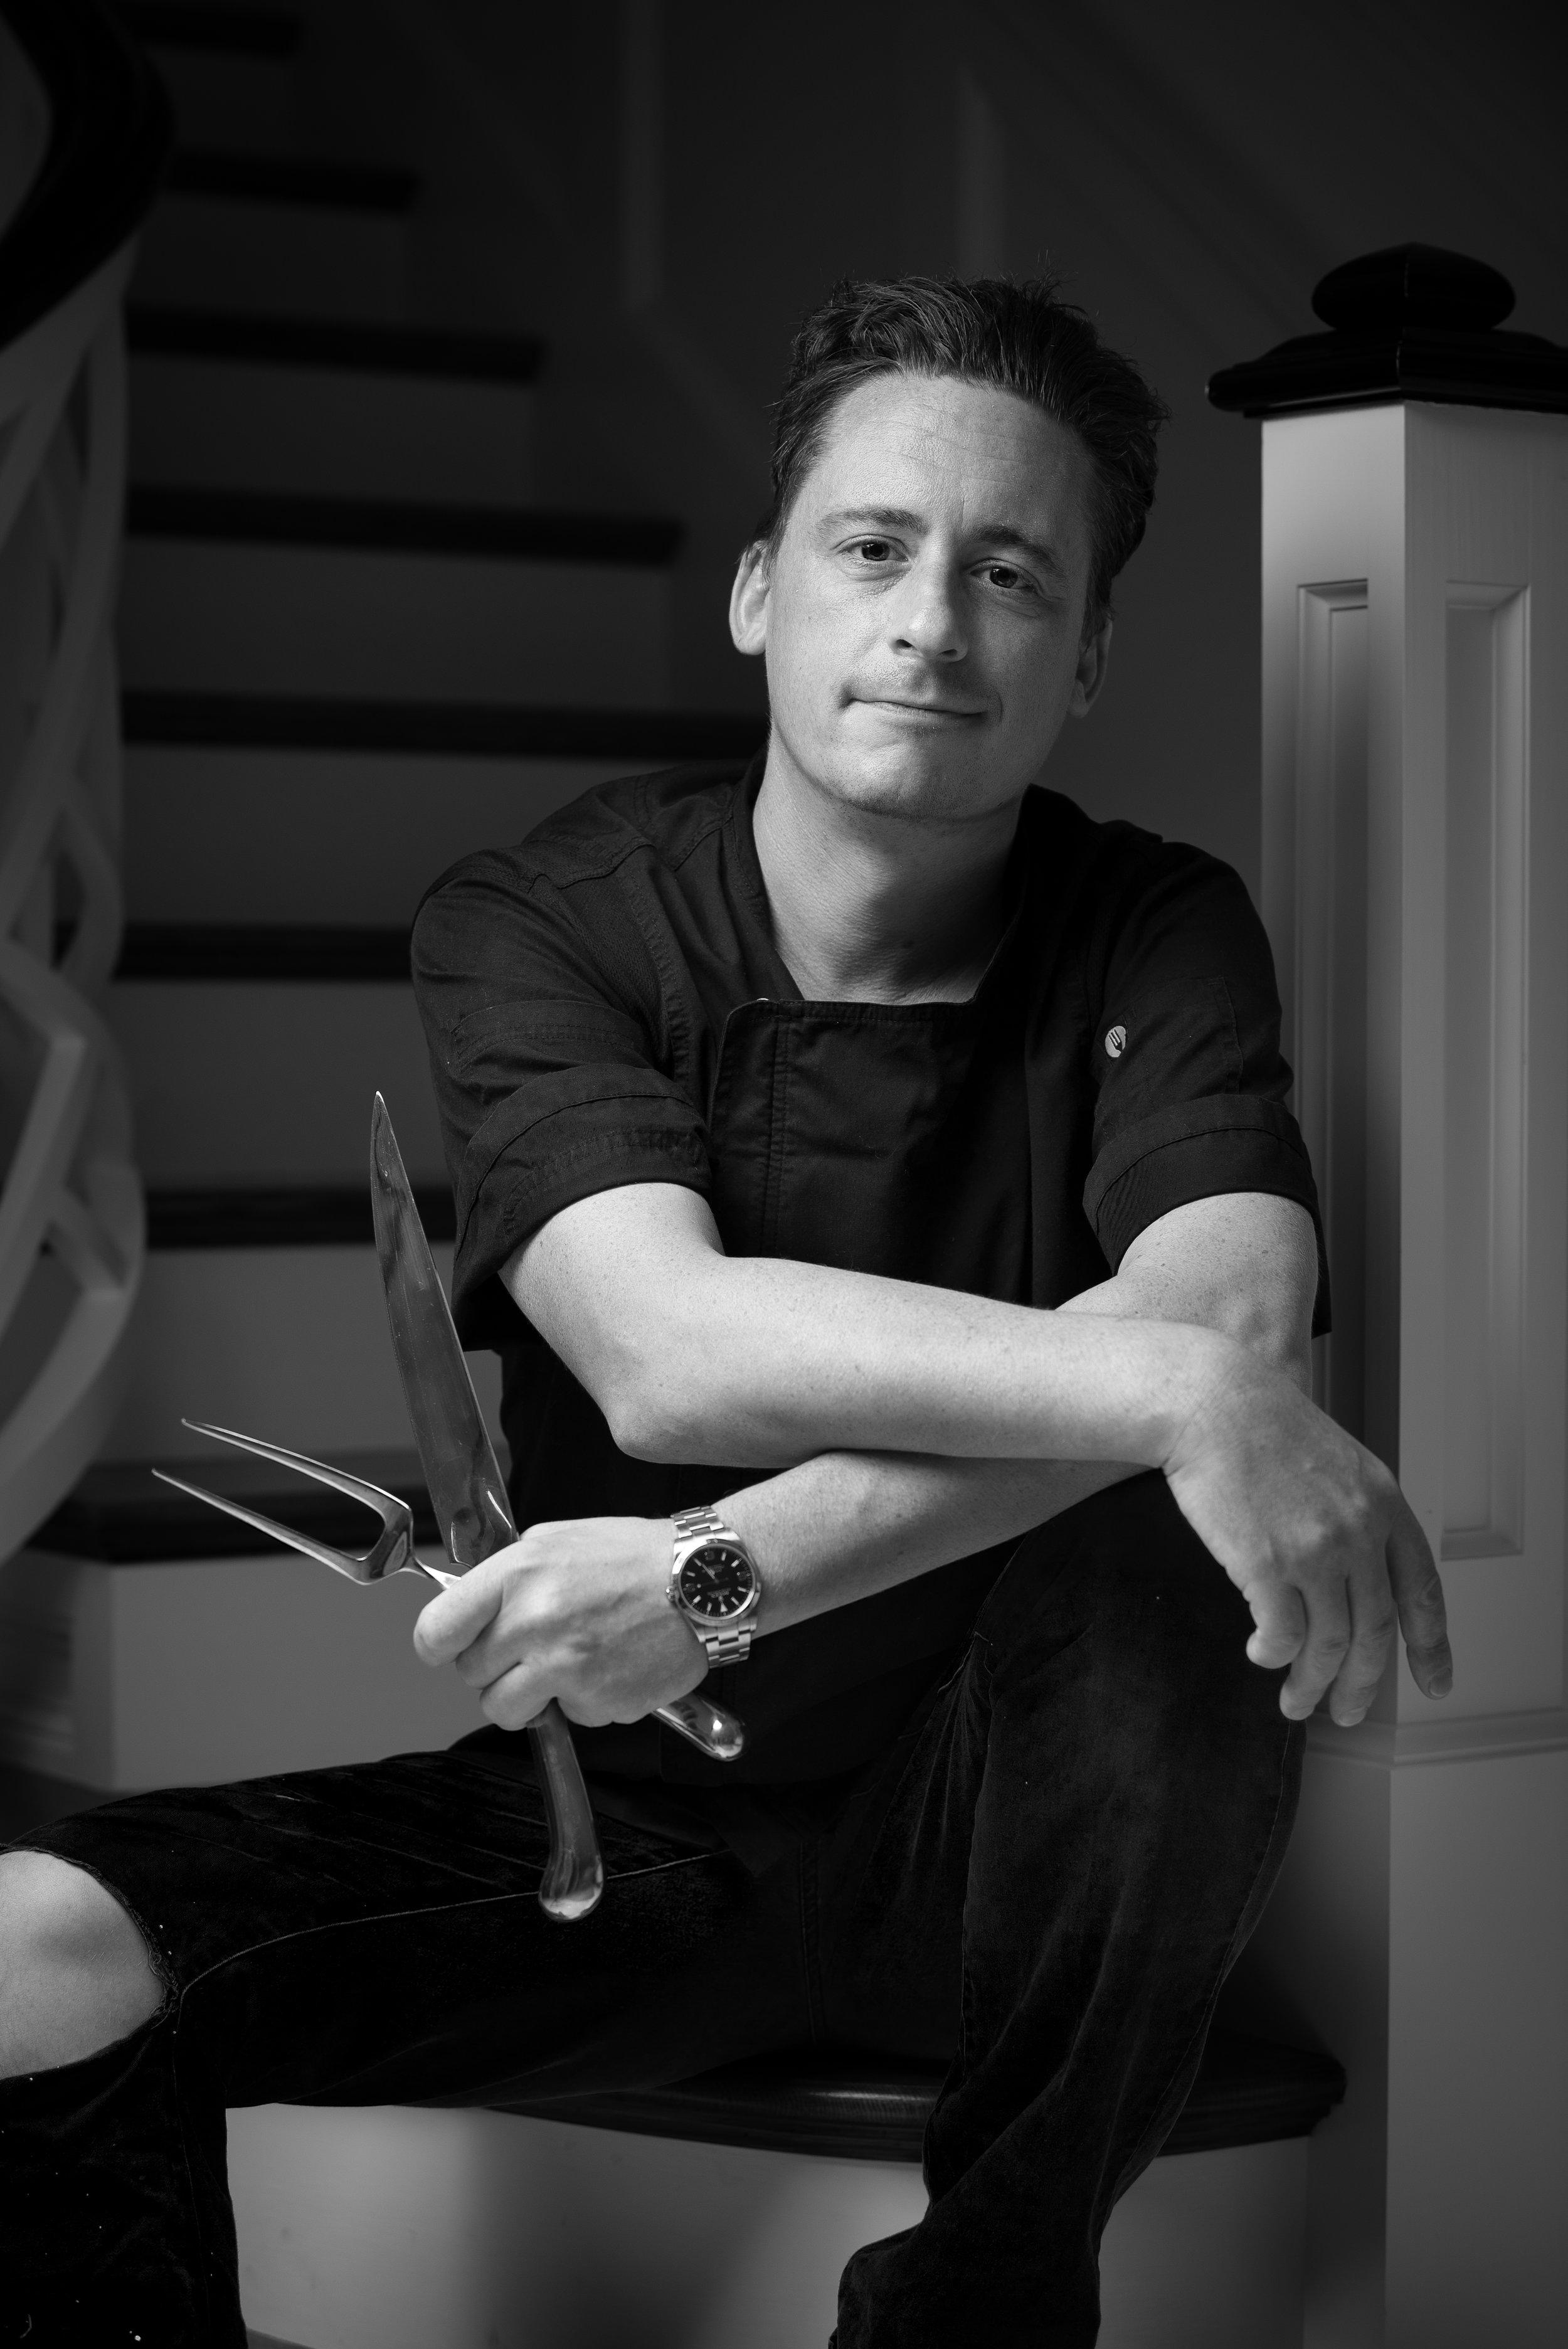 Chef_Guy.jpg